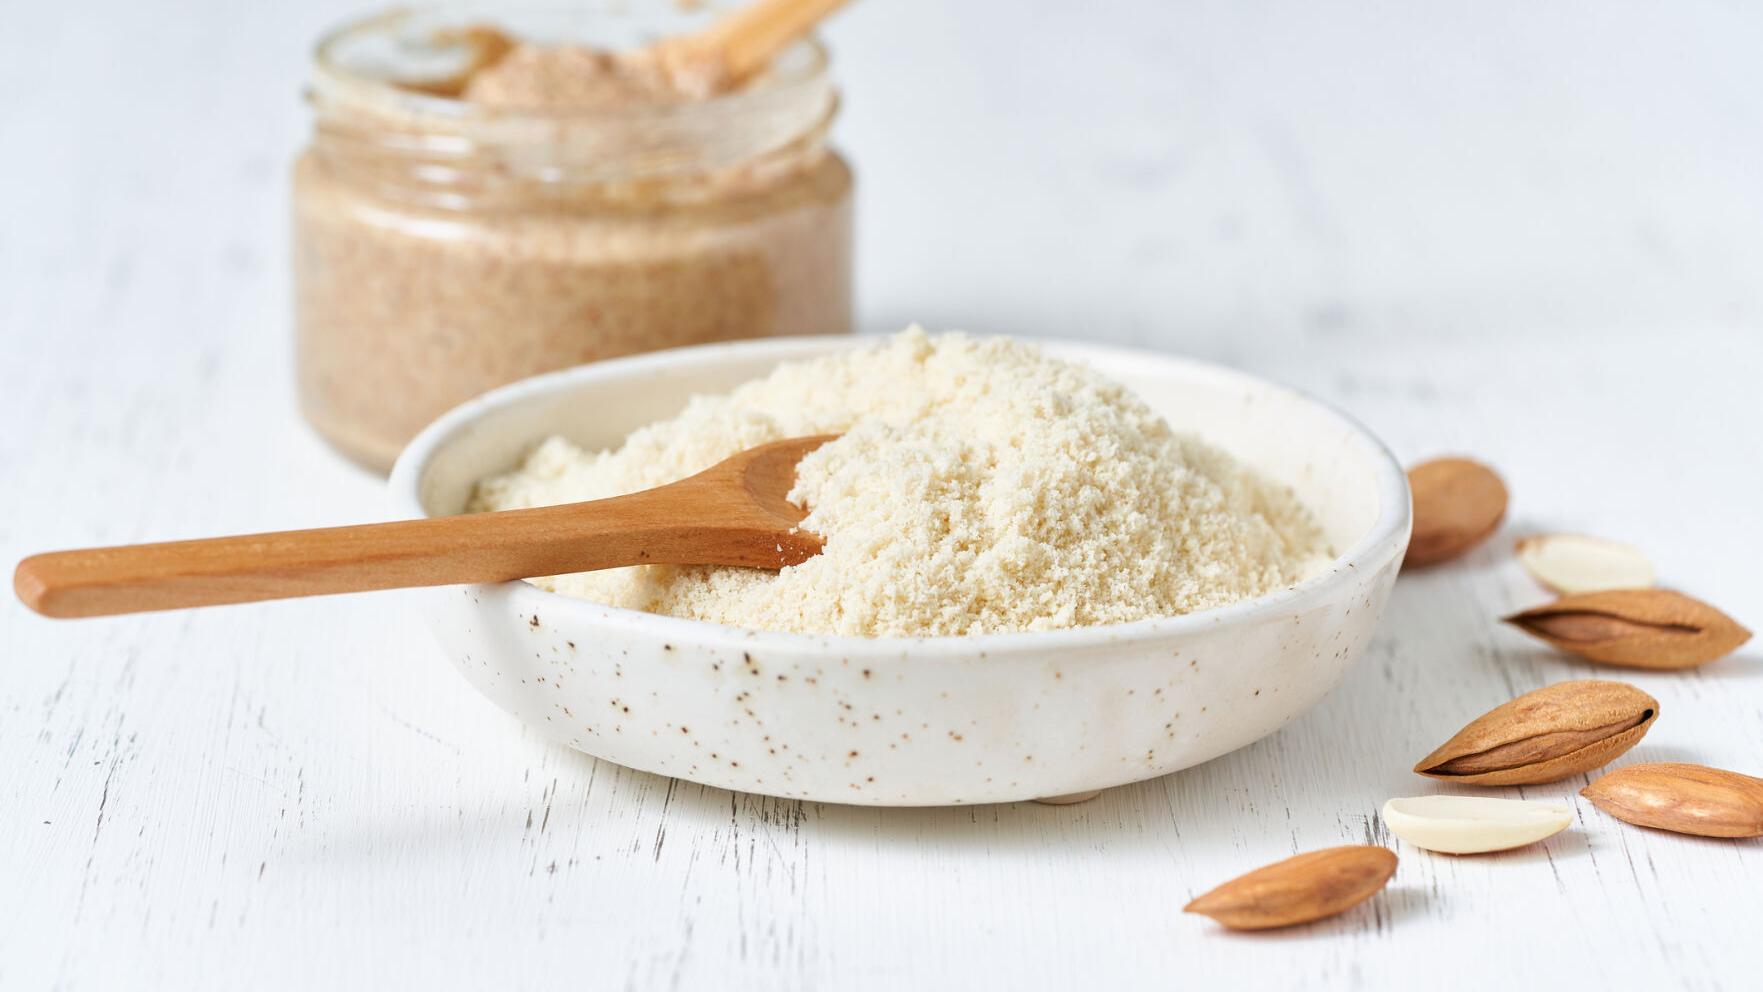 5 health benefits of almonds